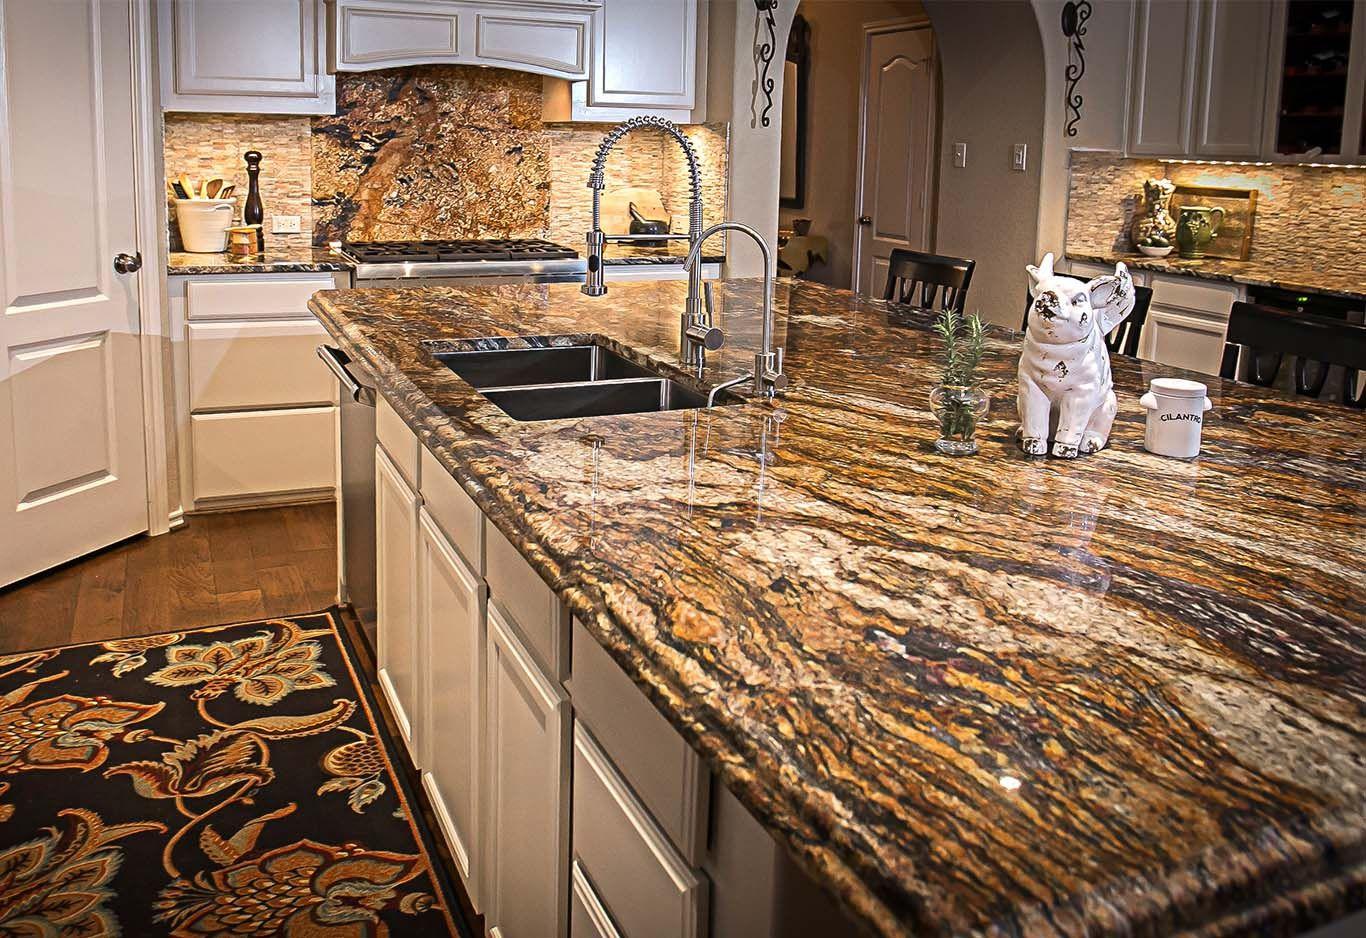 u much countertop white mussell cost granite how cabinets quartz guidesrhcountertopguidescom countertops with augusta do ga colonial olive rhpinterestcouk